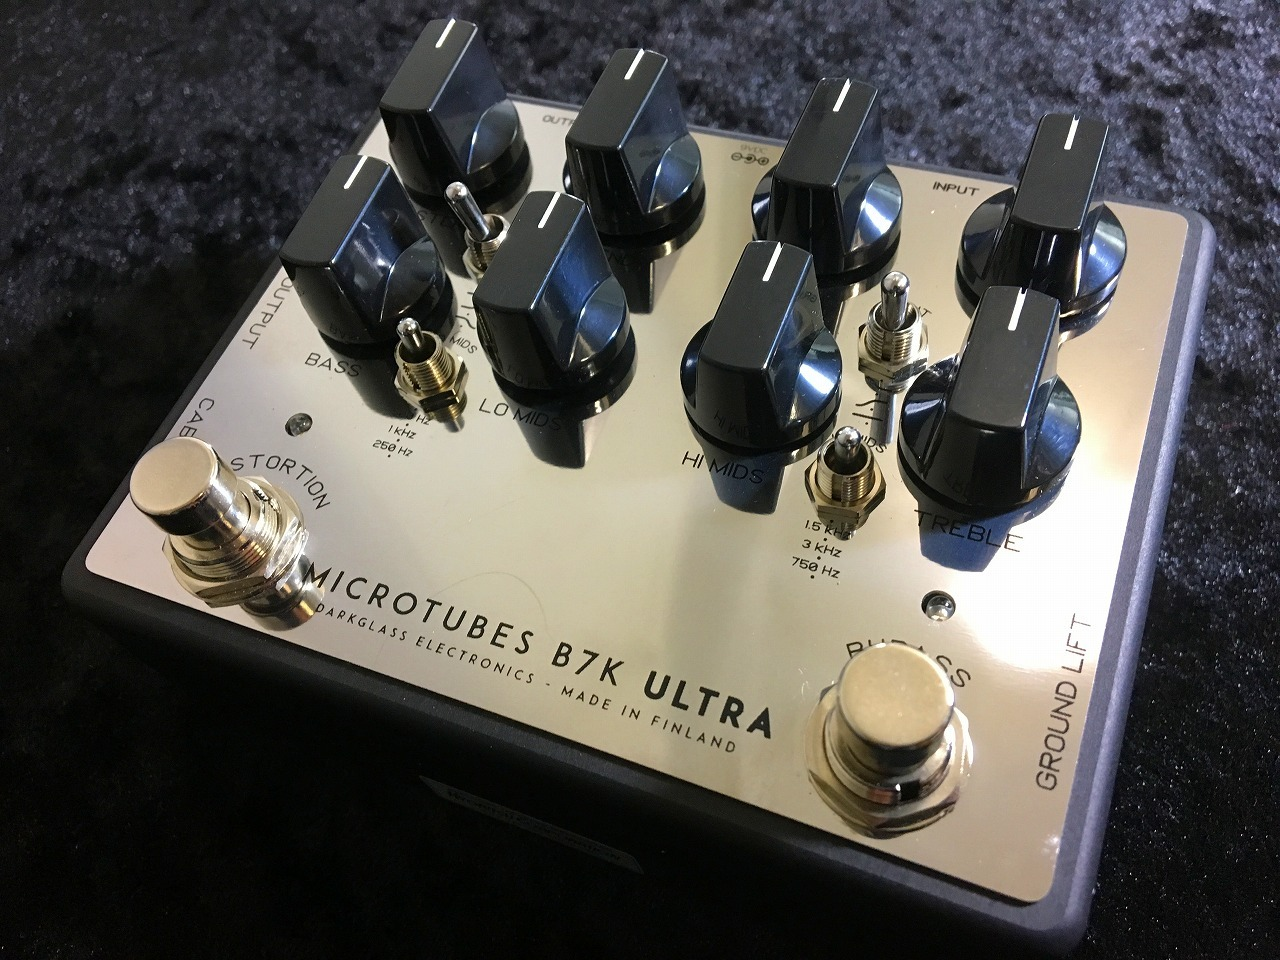 Darkglass Electronics Electronics Microtubes B7K ULTRA Microtubes V2 V2 Mirror Limited Edition【NEW】 ※限定モデル!!【日本総本店ベースセンター在庫品】, エンデュランス:76fbc6a3 --- jpworks.be